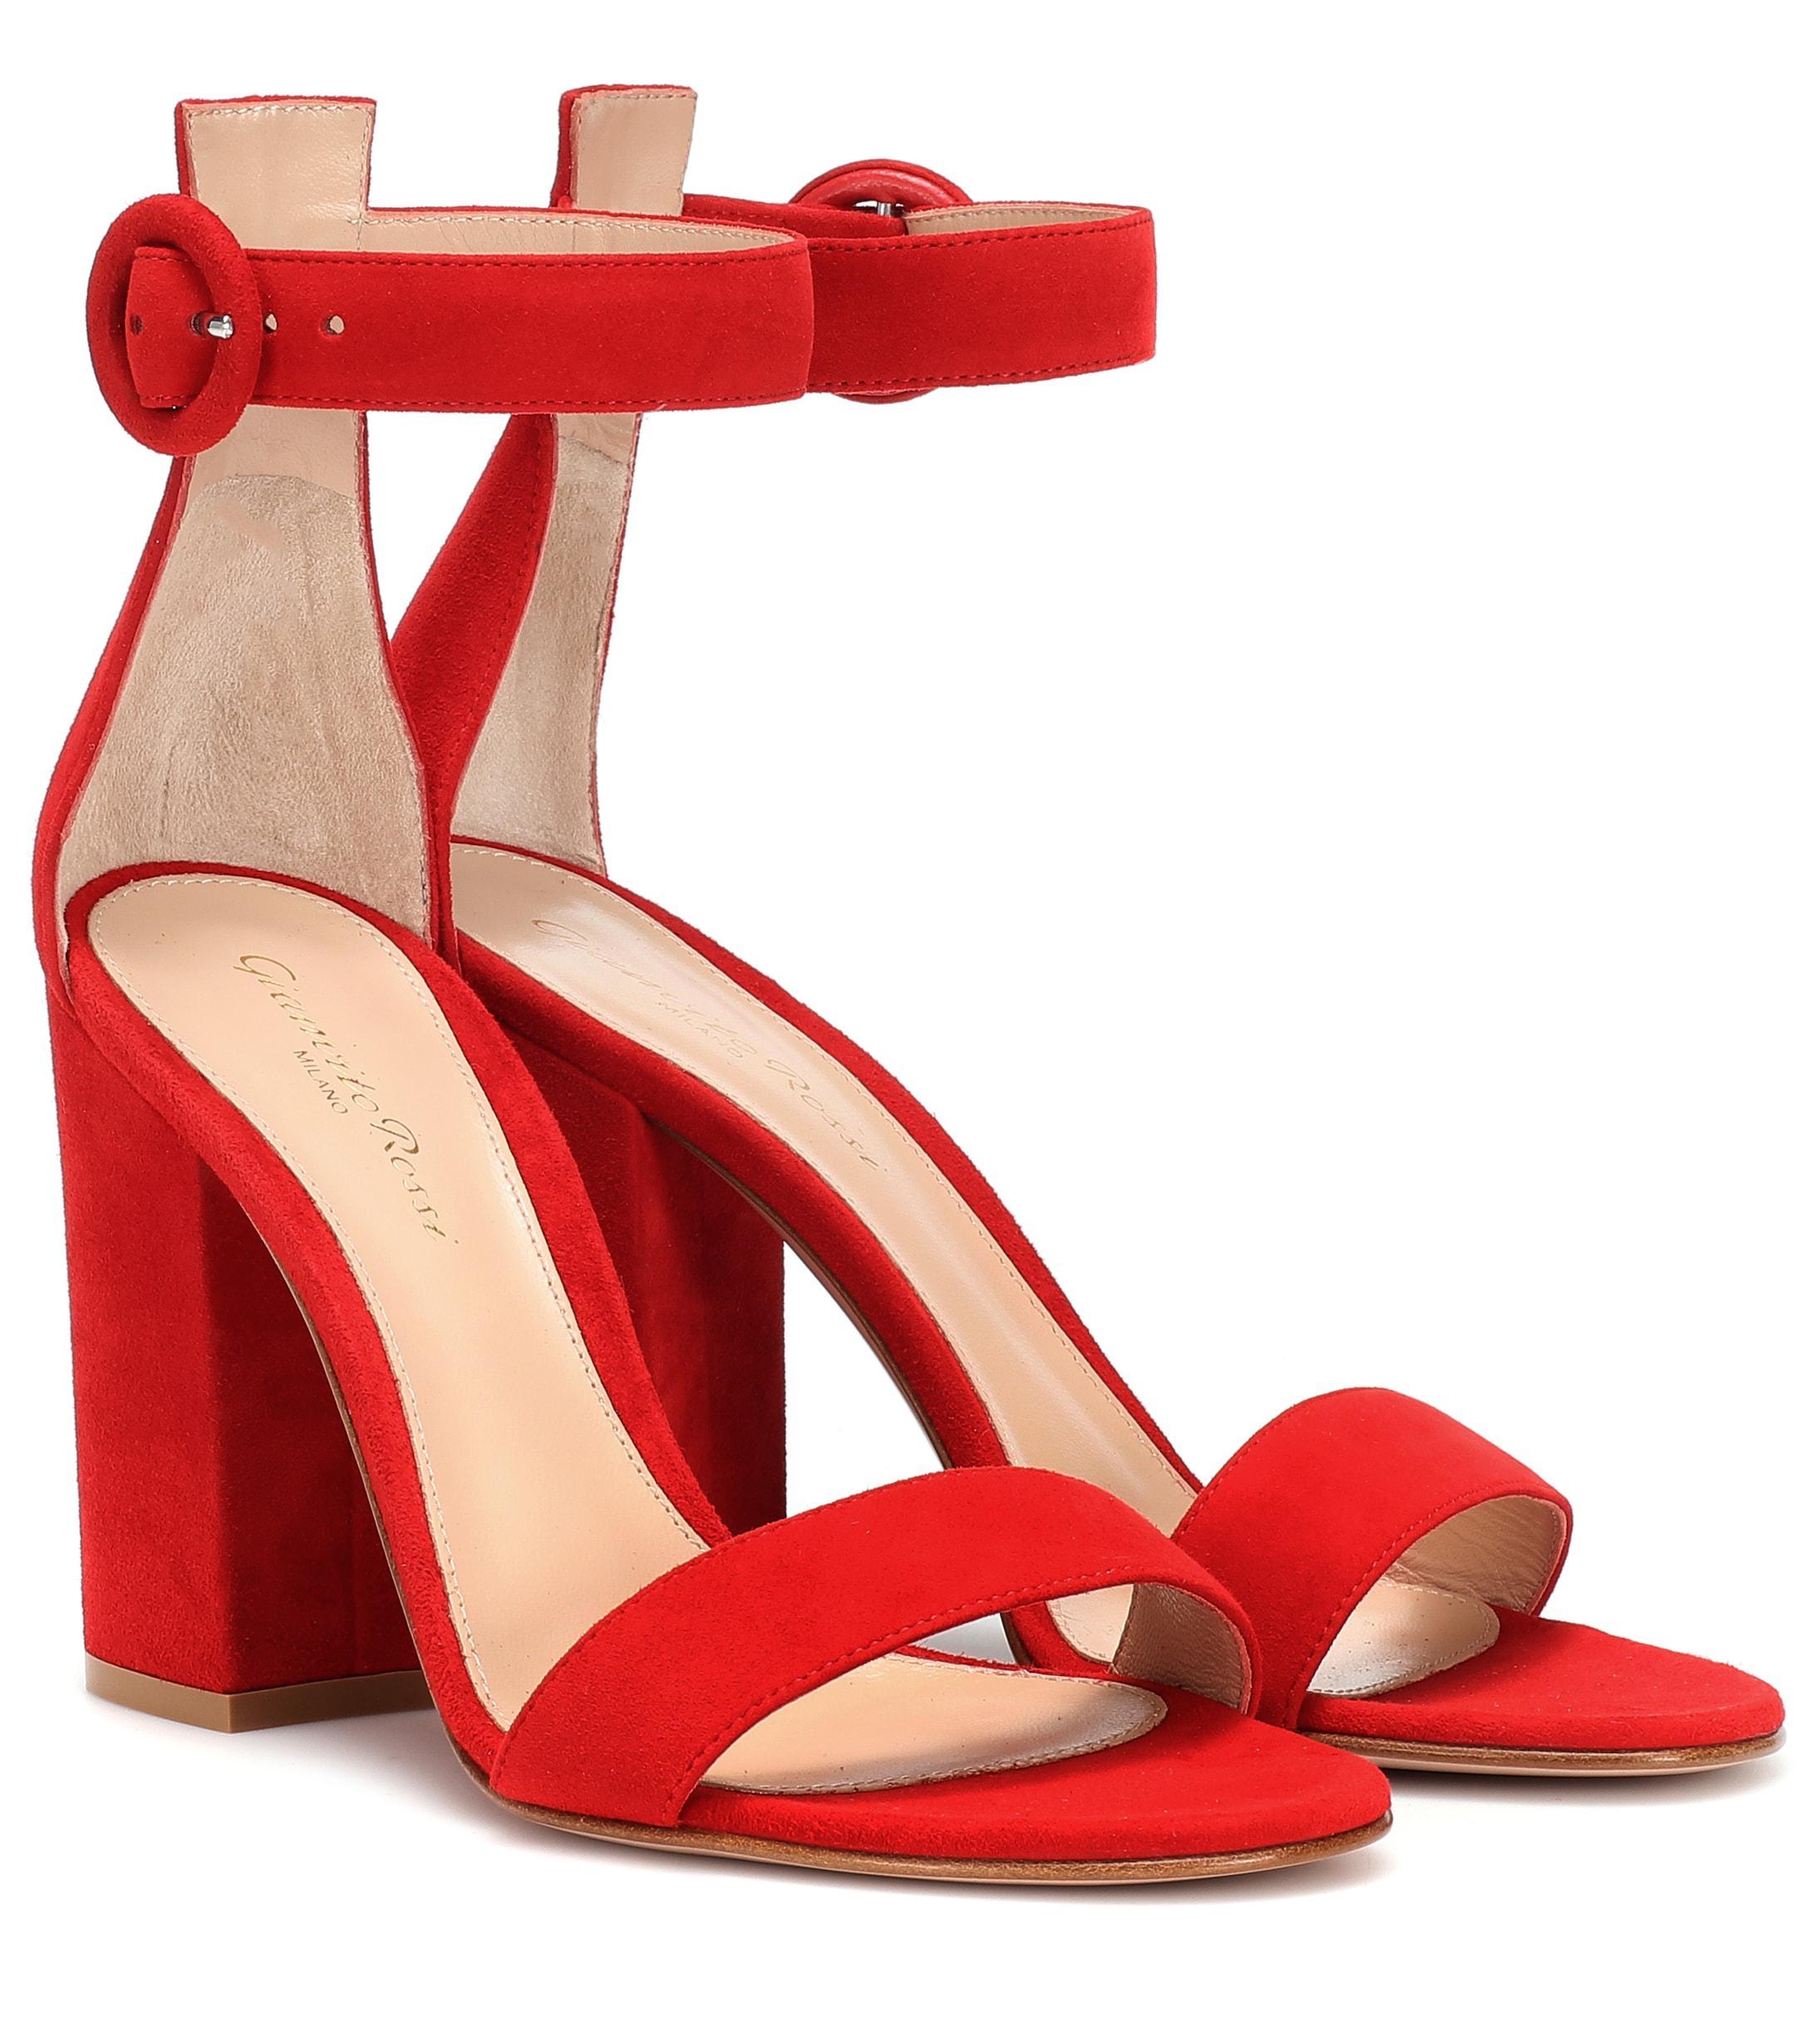 b9241dff33ce Lyst - Gianvito Rossi Versilia Suede Sandals in Red